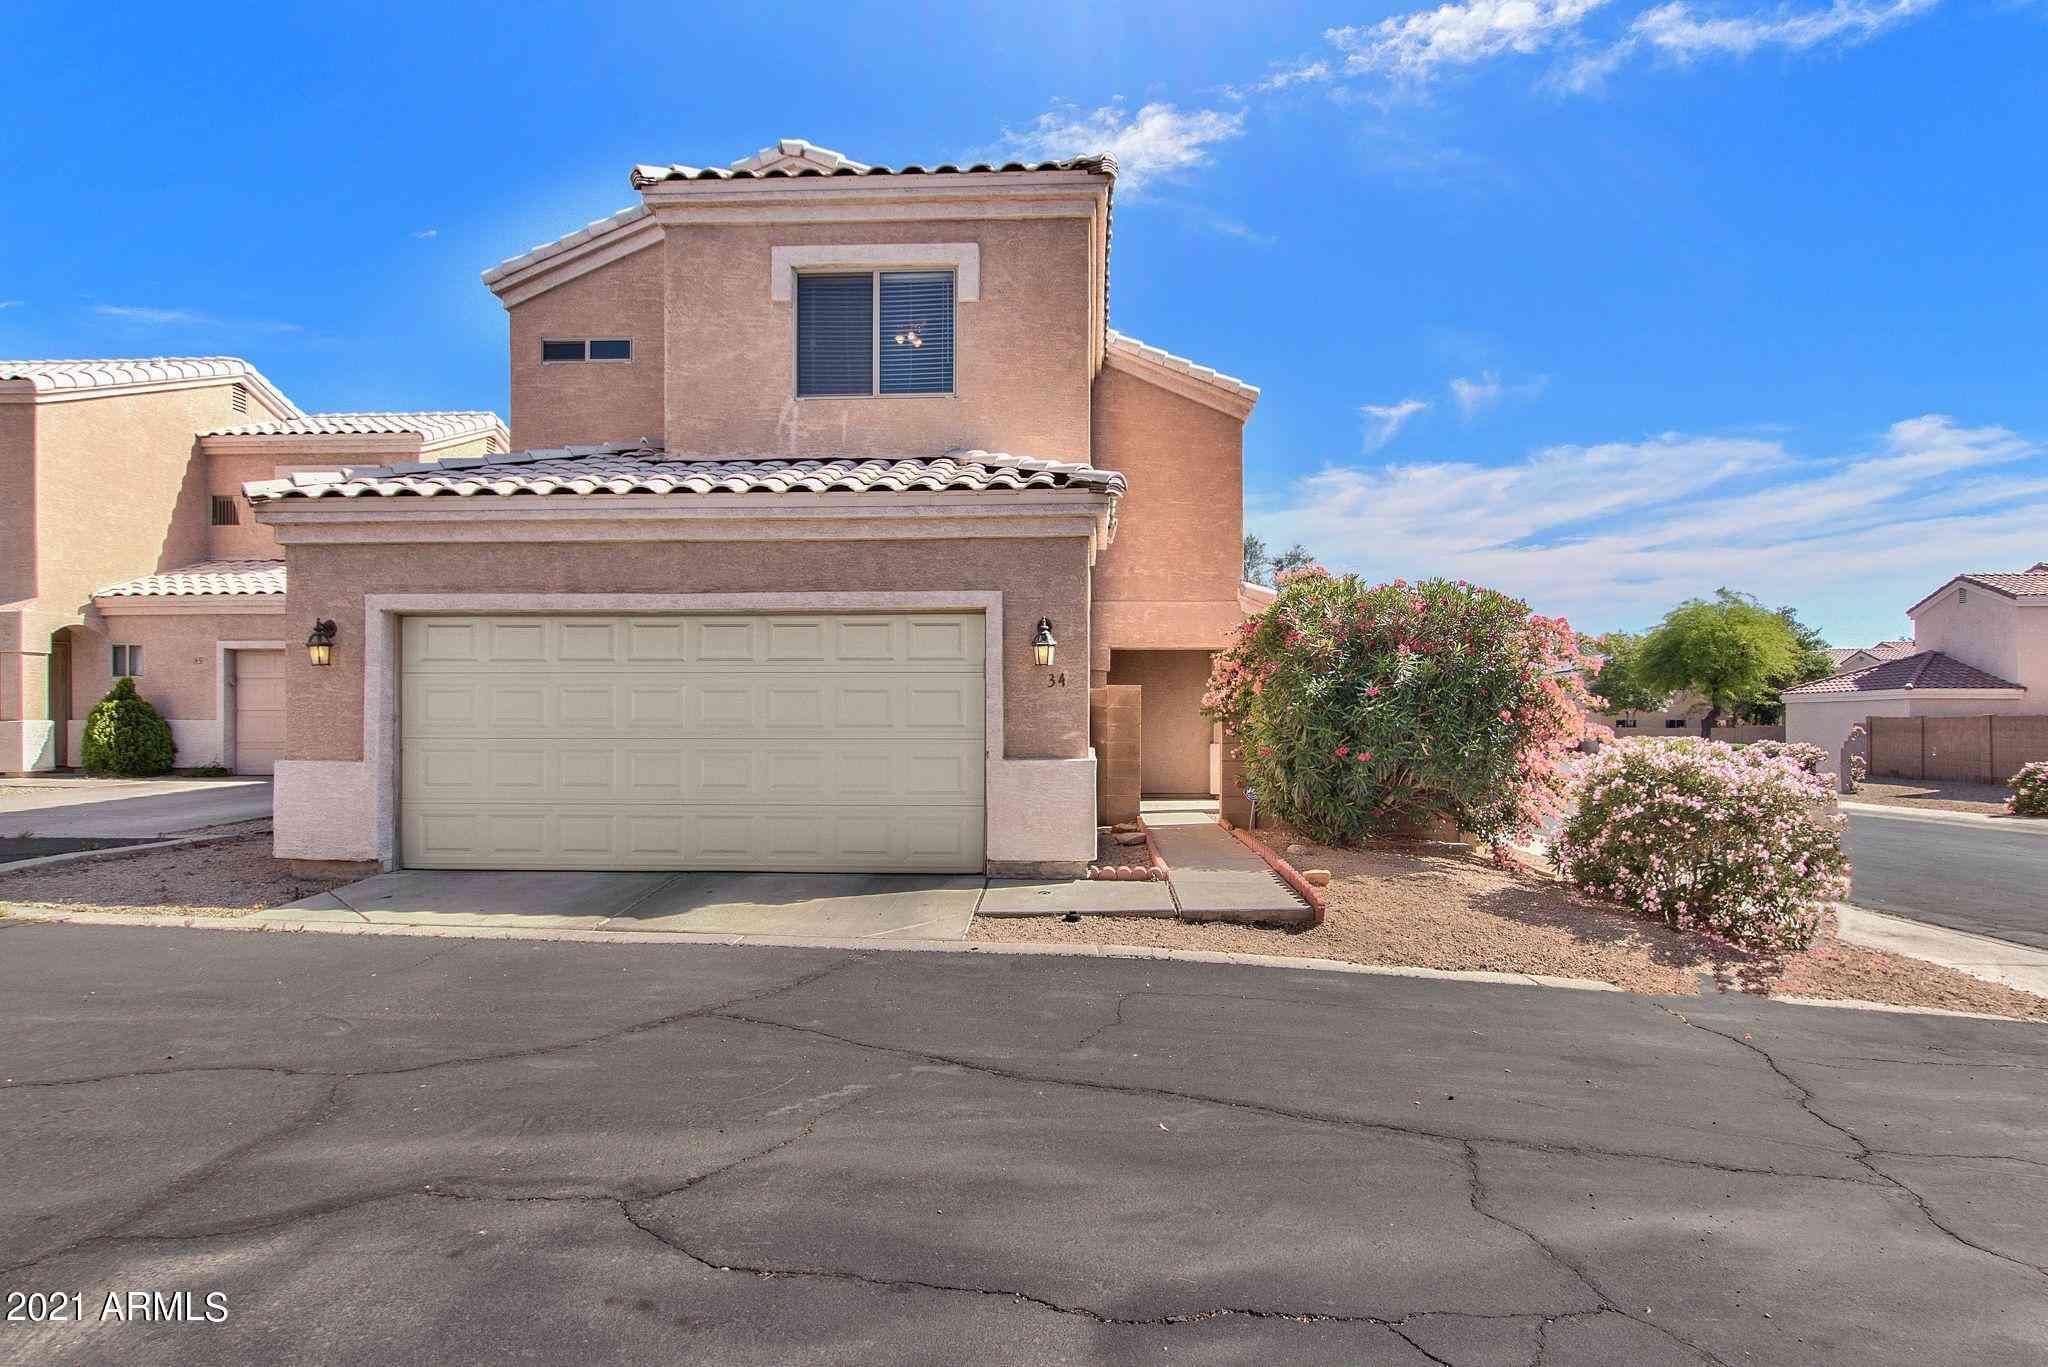 1750 W UNION HILLS Drive #34, Phoenix, AZ, 85027,